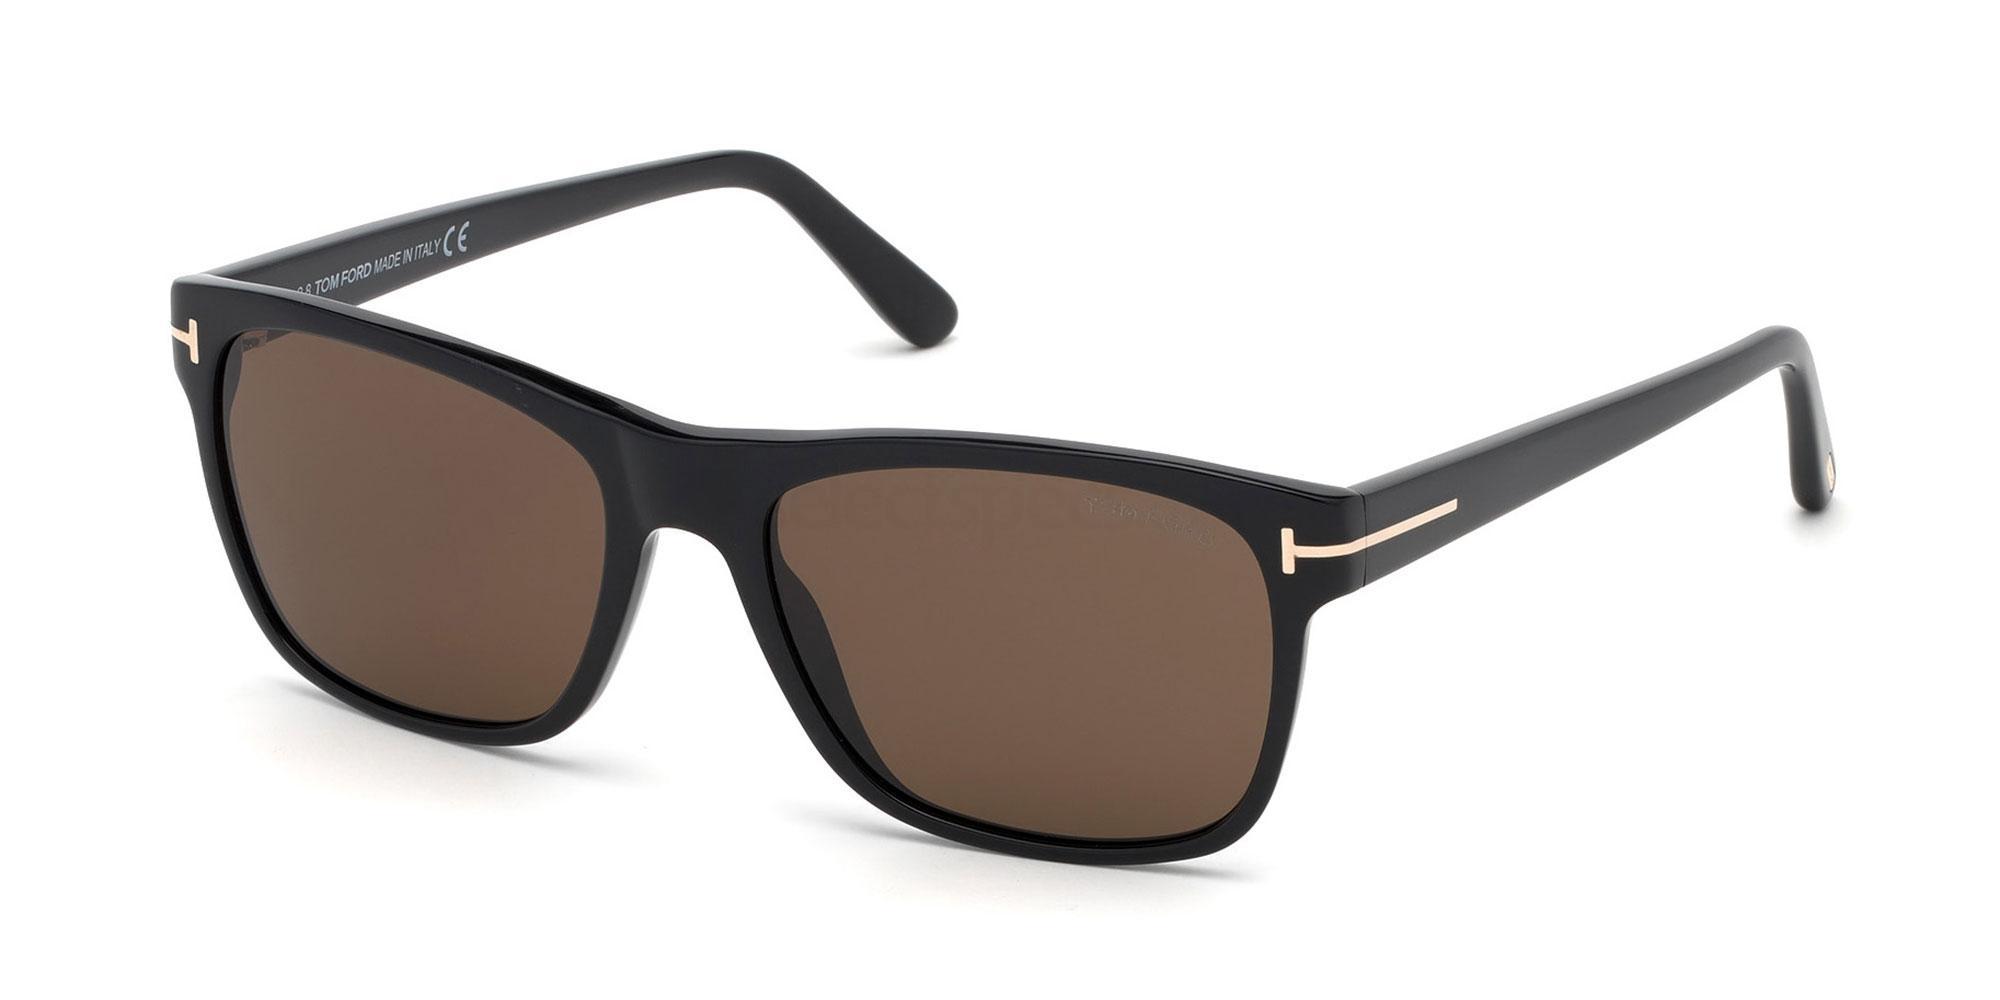 01J FT0698 Sunglasses, Tom Ford